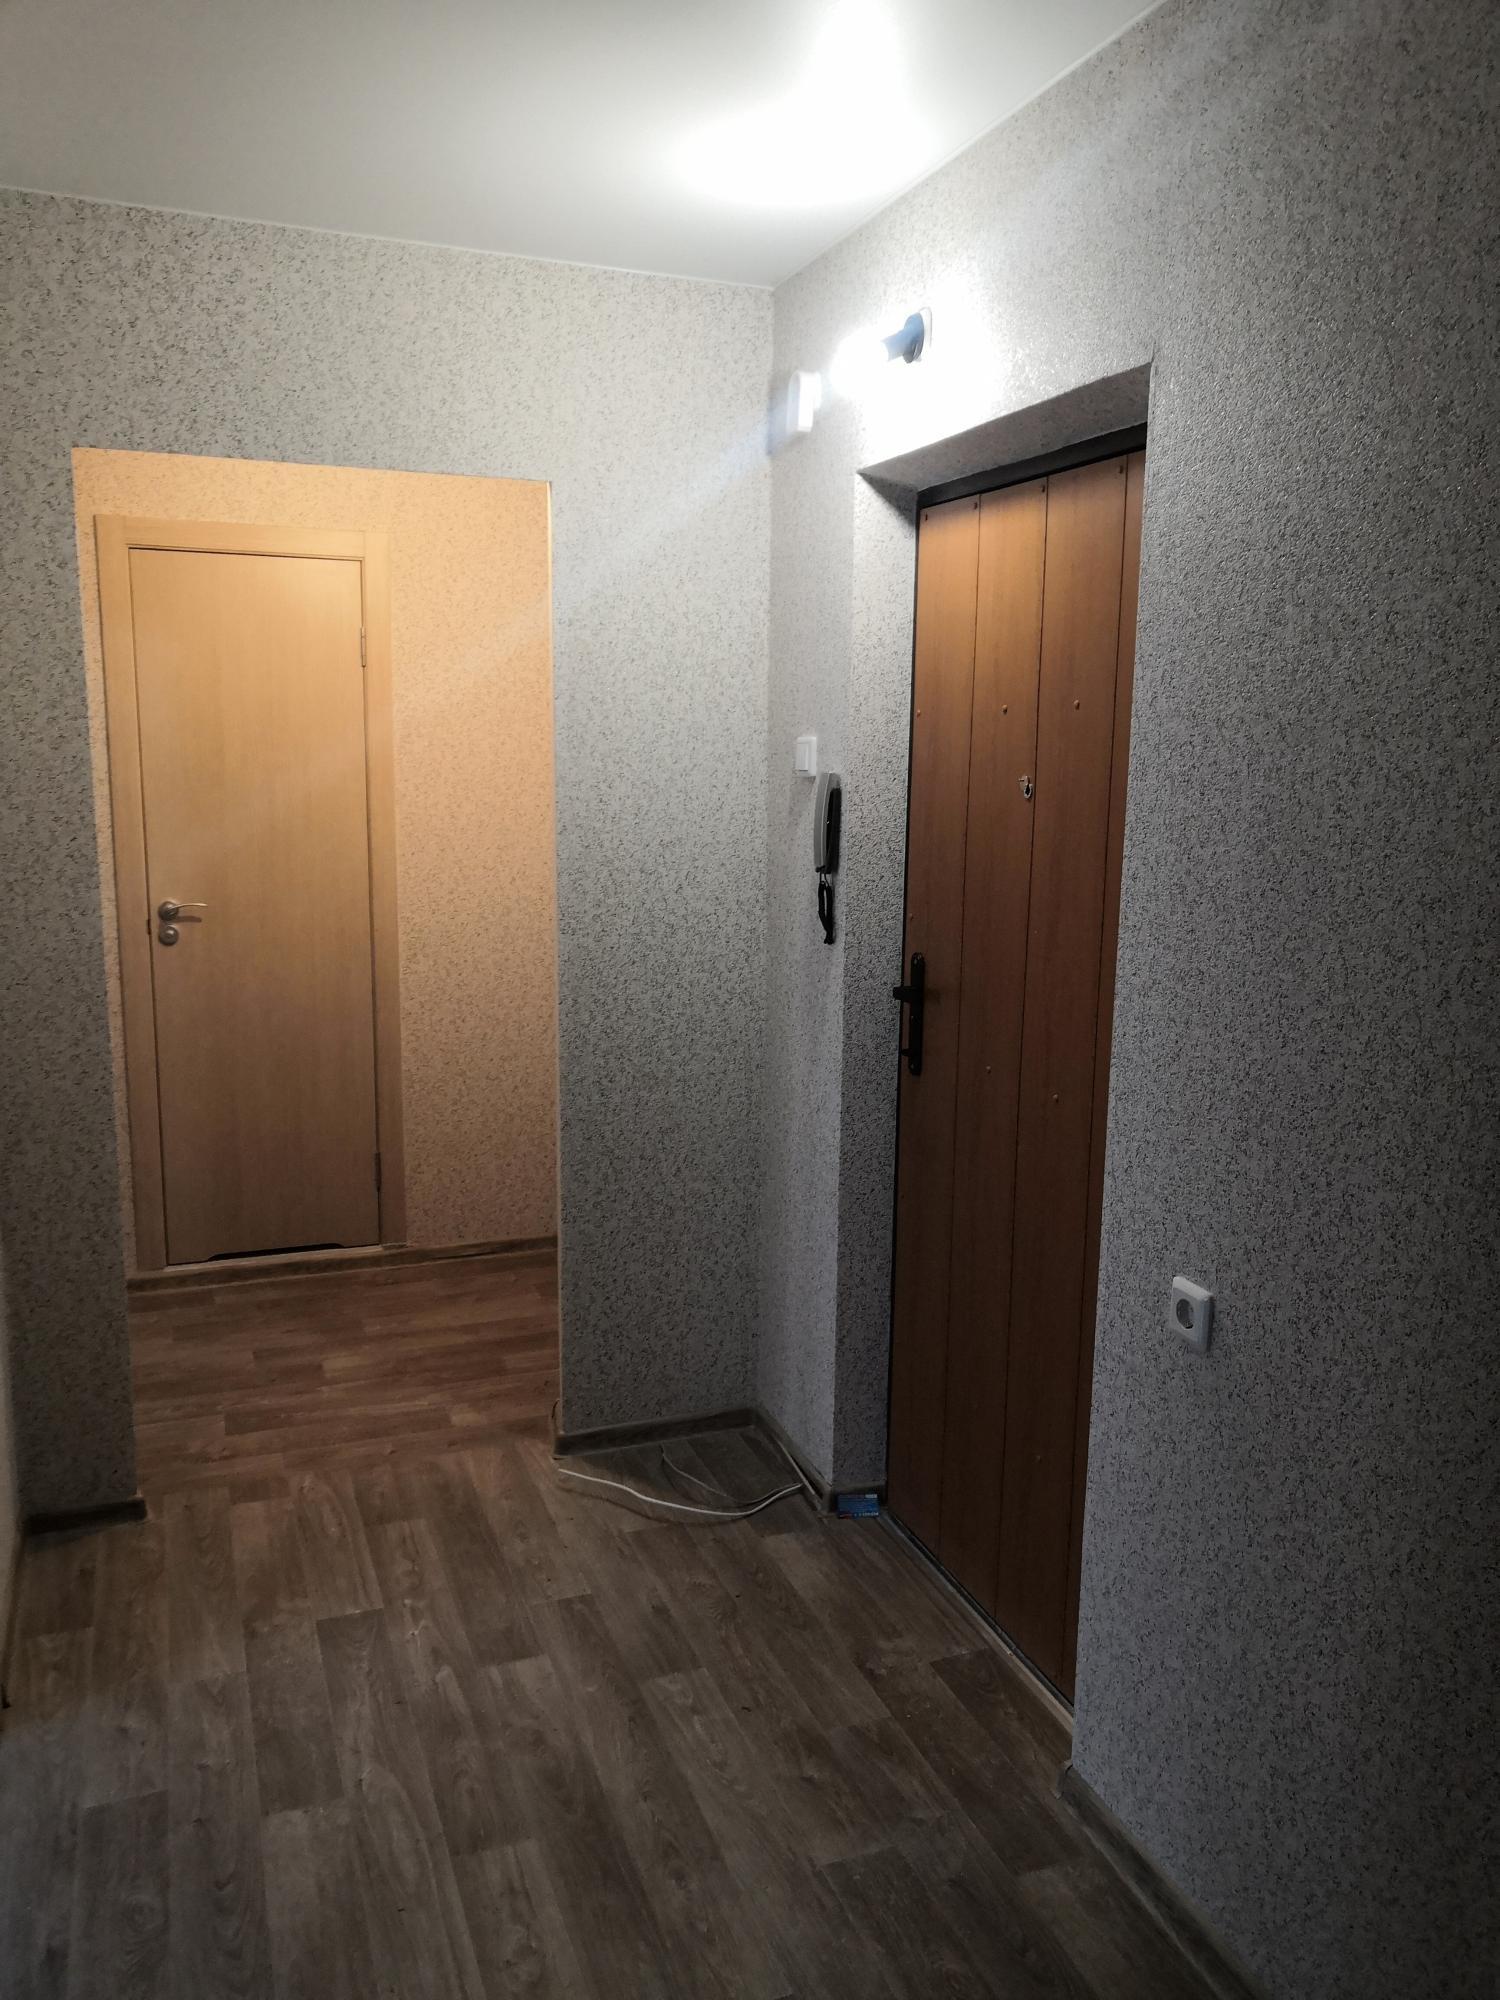 1к квартира улица Партизана Железняка, 59   13000   аренда в Красноярске фото 3